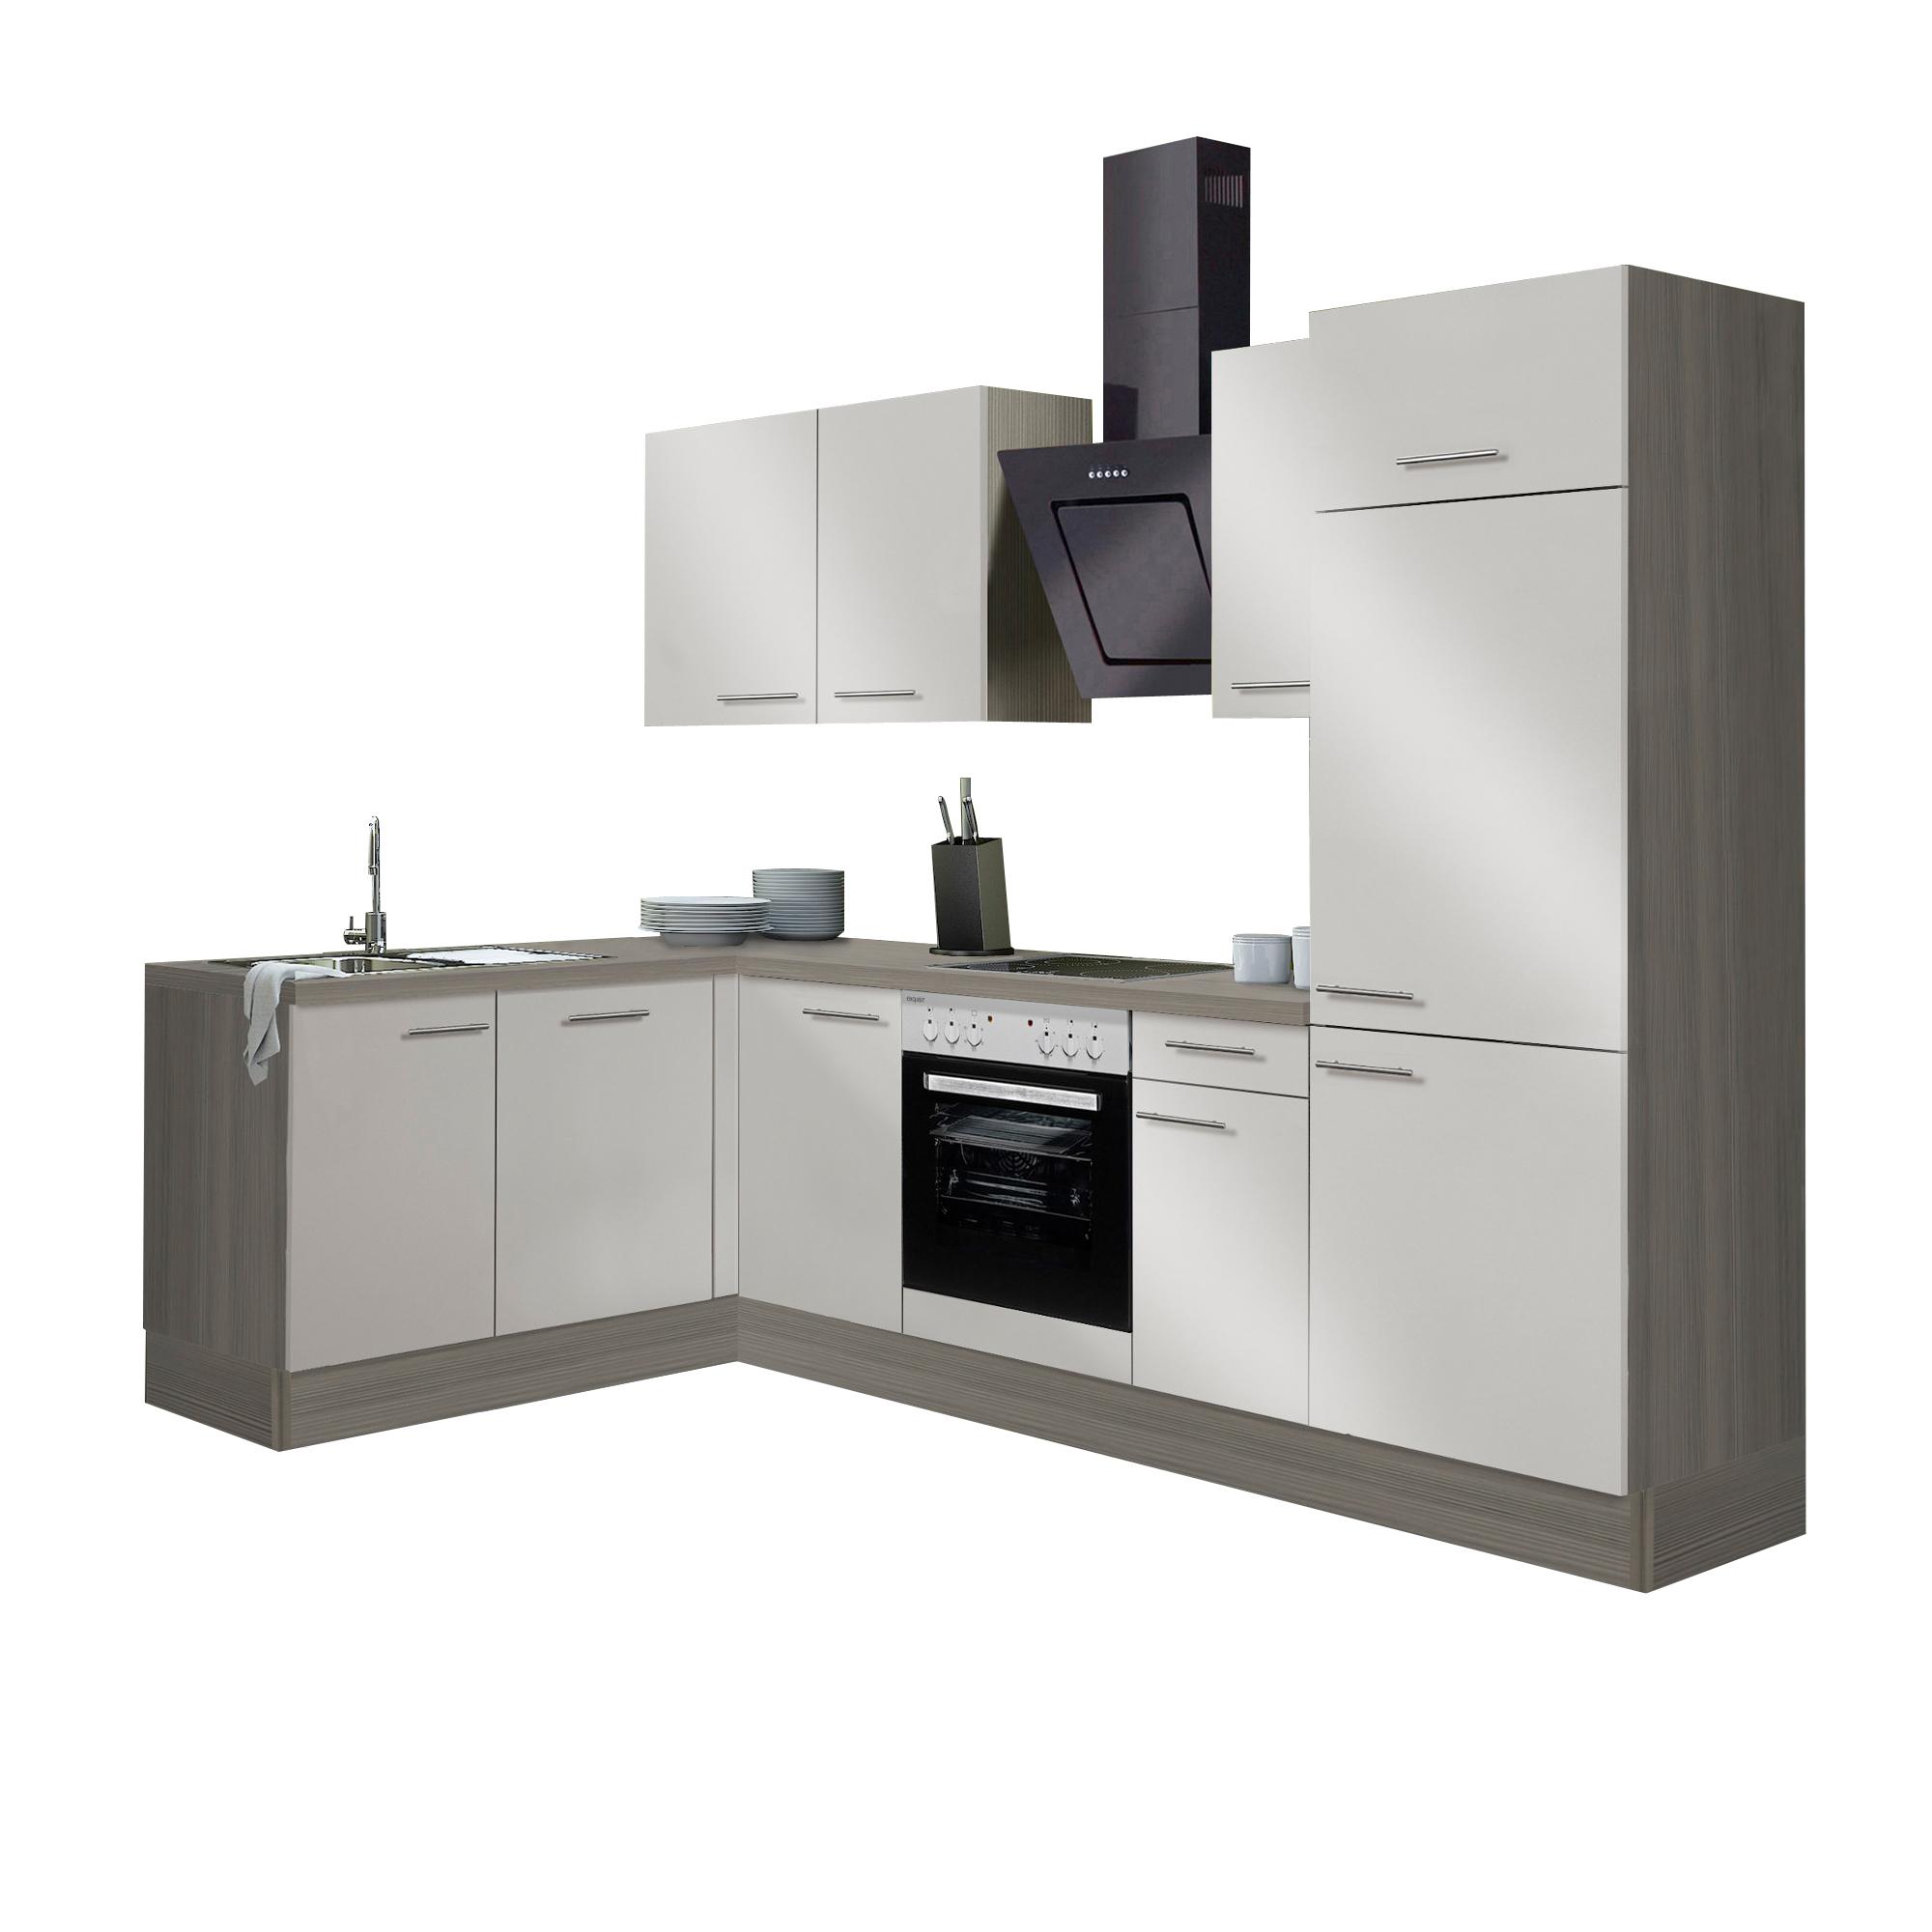 eckk che cadiz vario 2 2 k che mit e ger ten breite 270 x 175 cm beige k che k chenzeilen. Black Bedroom Furniture Sets. Home Design Ideas